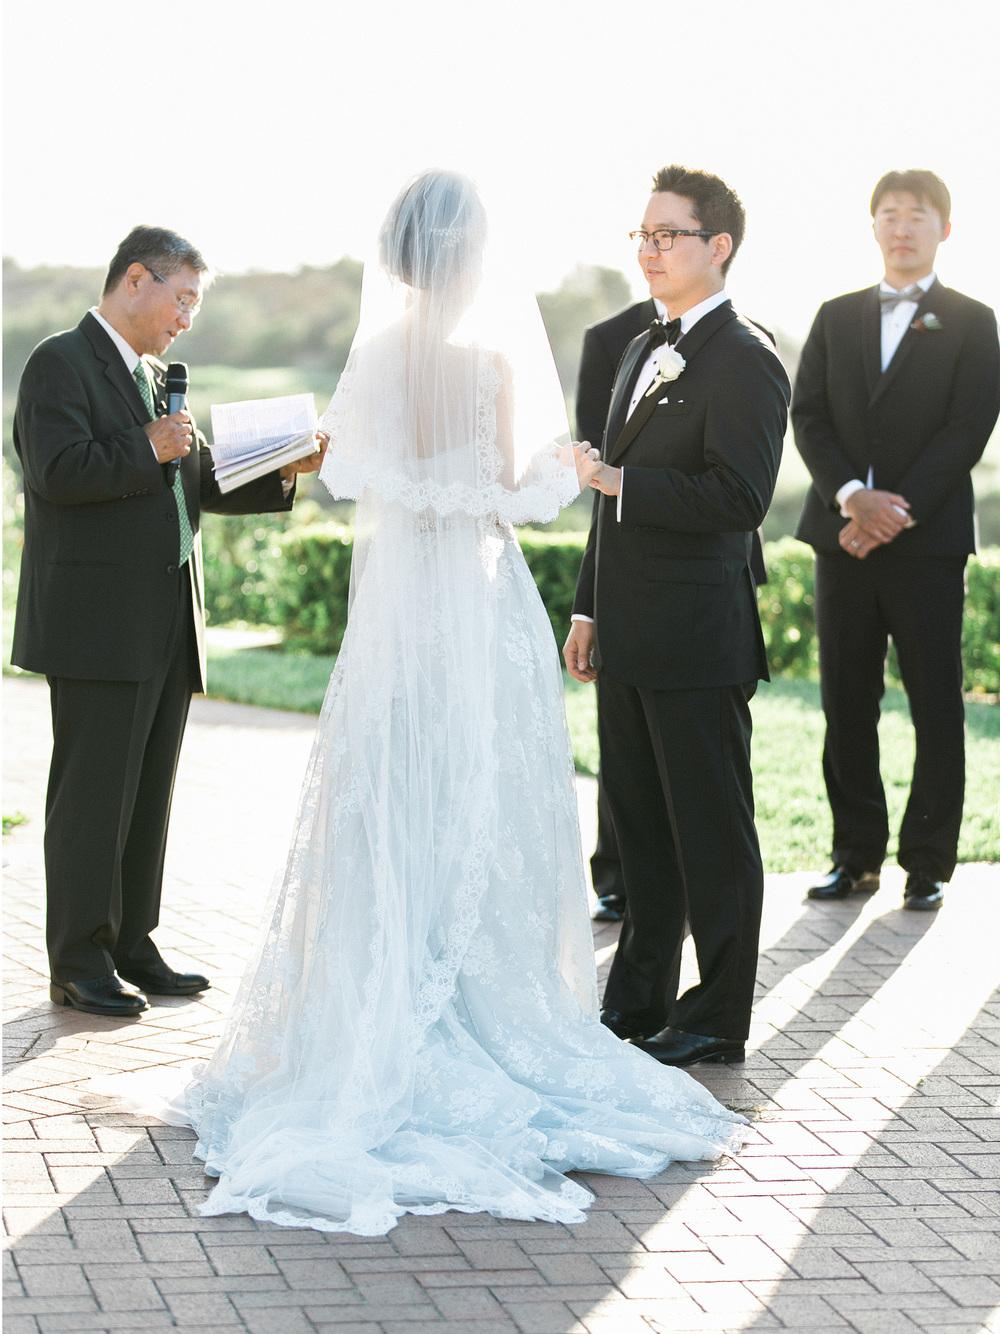 Pelican-hill-wedding-13